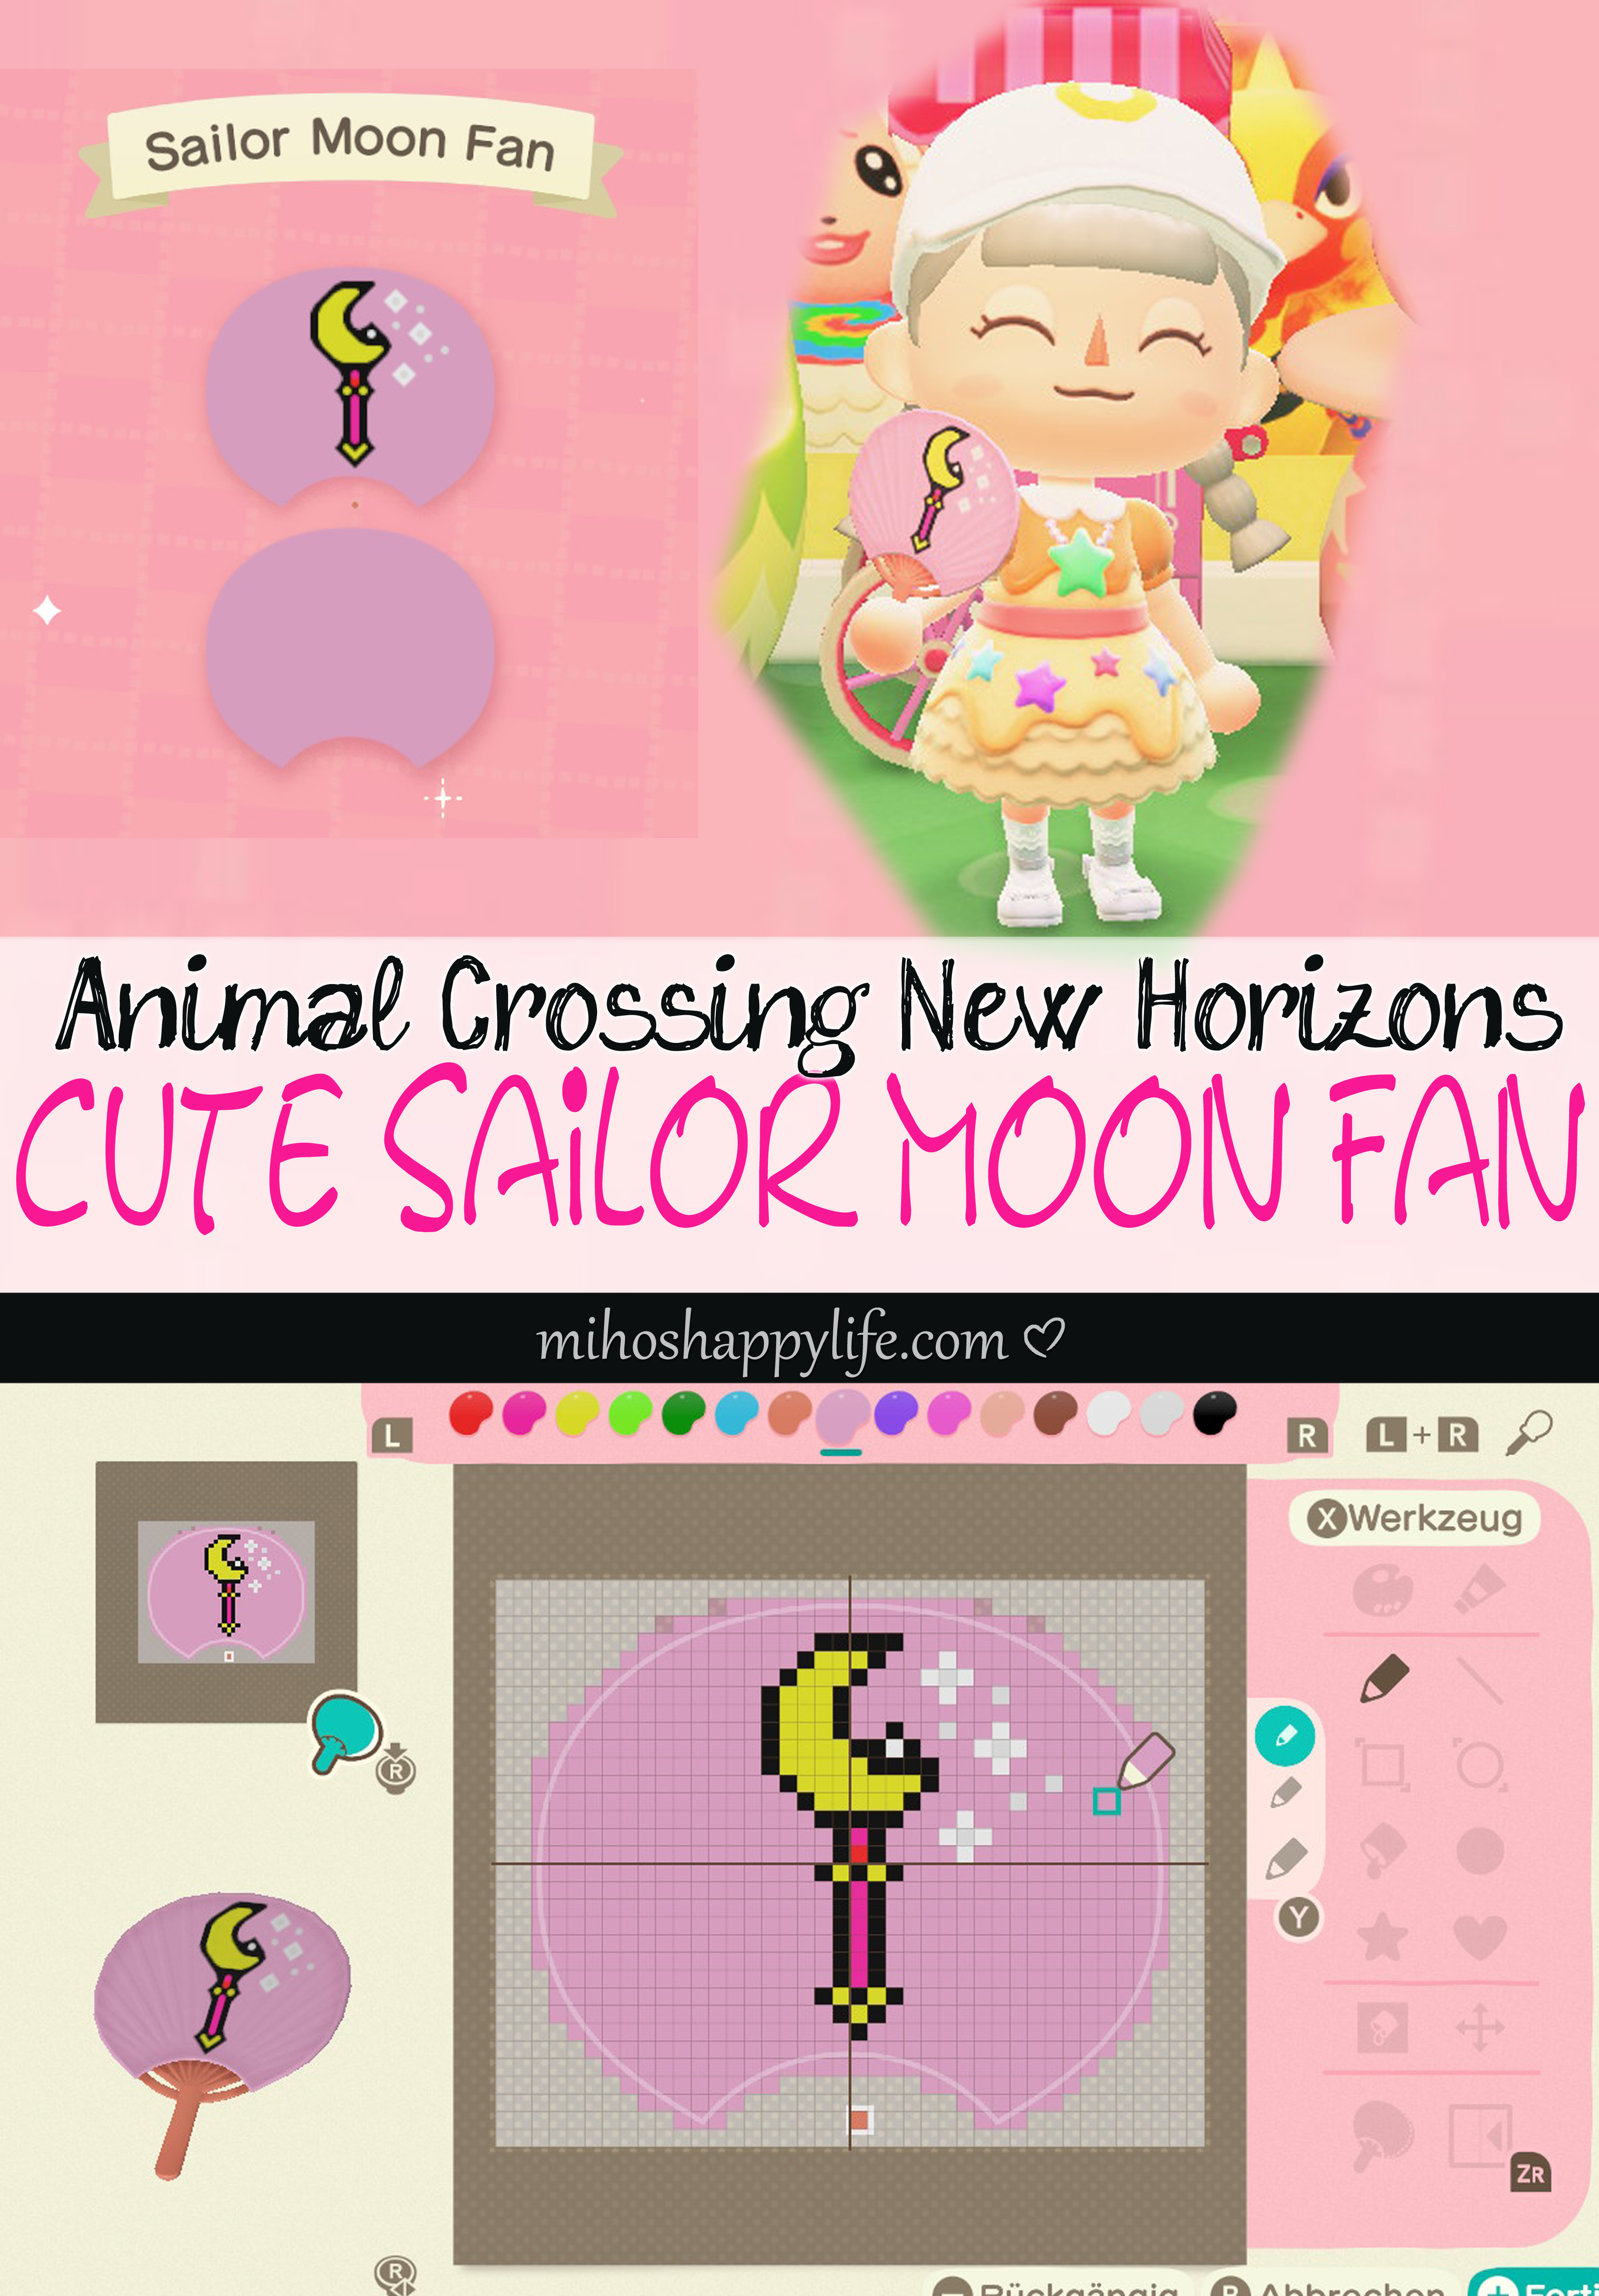 mihoshappylife-animal-crossing-sailormoon-fan